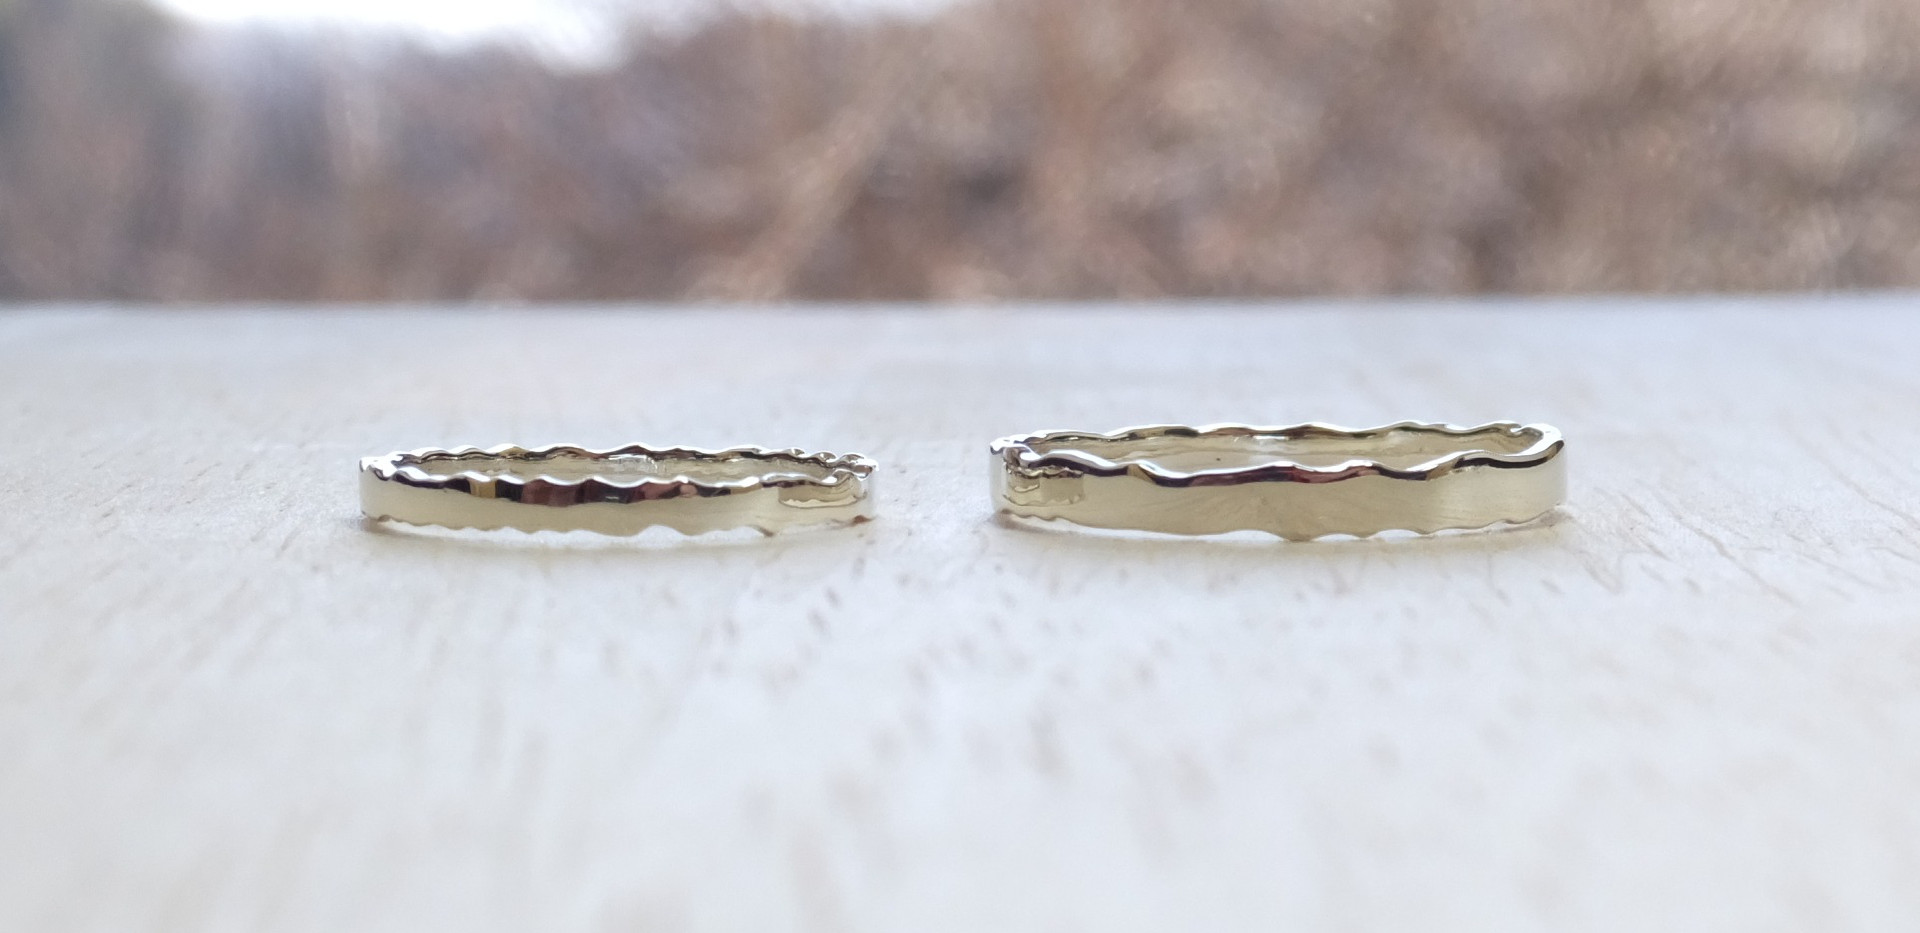 genchou design 手作り結婚指輪〈yuryou/夕稜〉 K18ホワイトゴールド 鏡面仕上げ